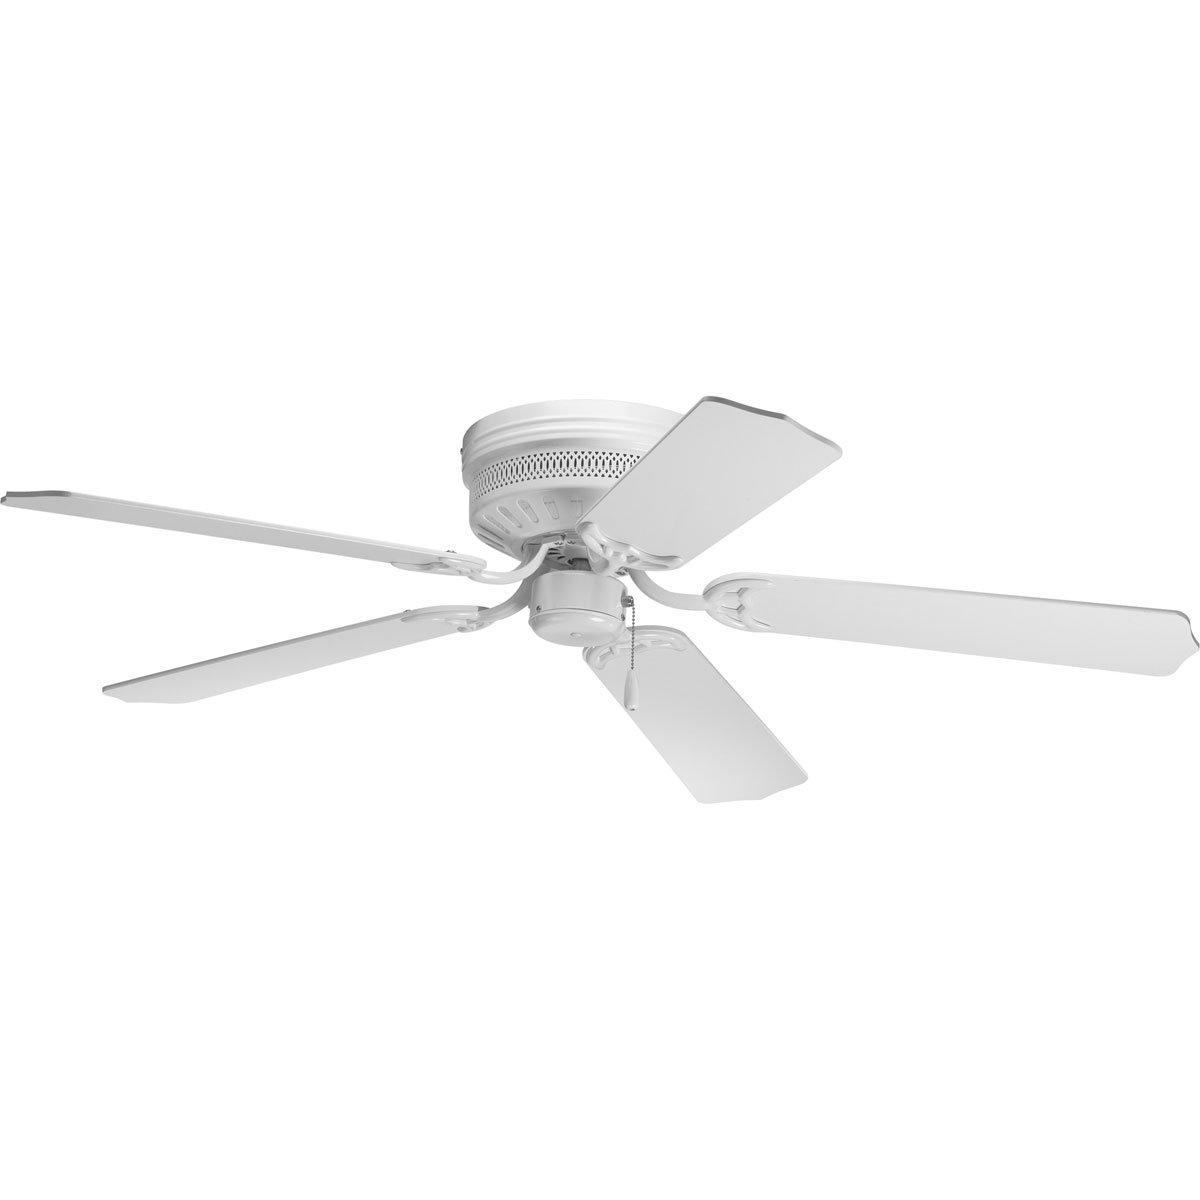 Amazon.com: Progress Lighting P2525-30 52-Inch Hugger 5 Blade Fan ...